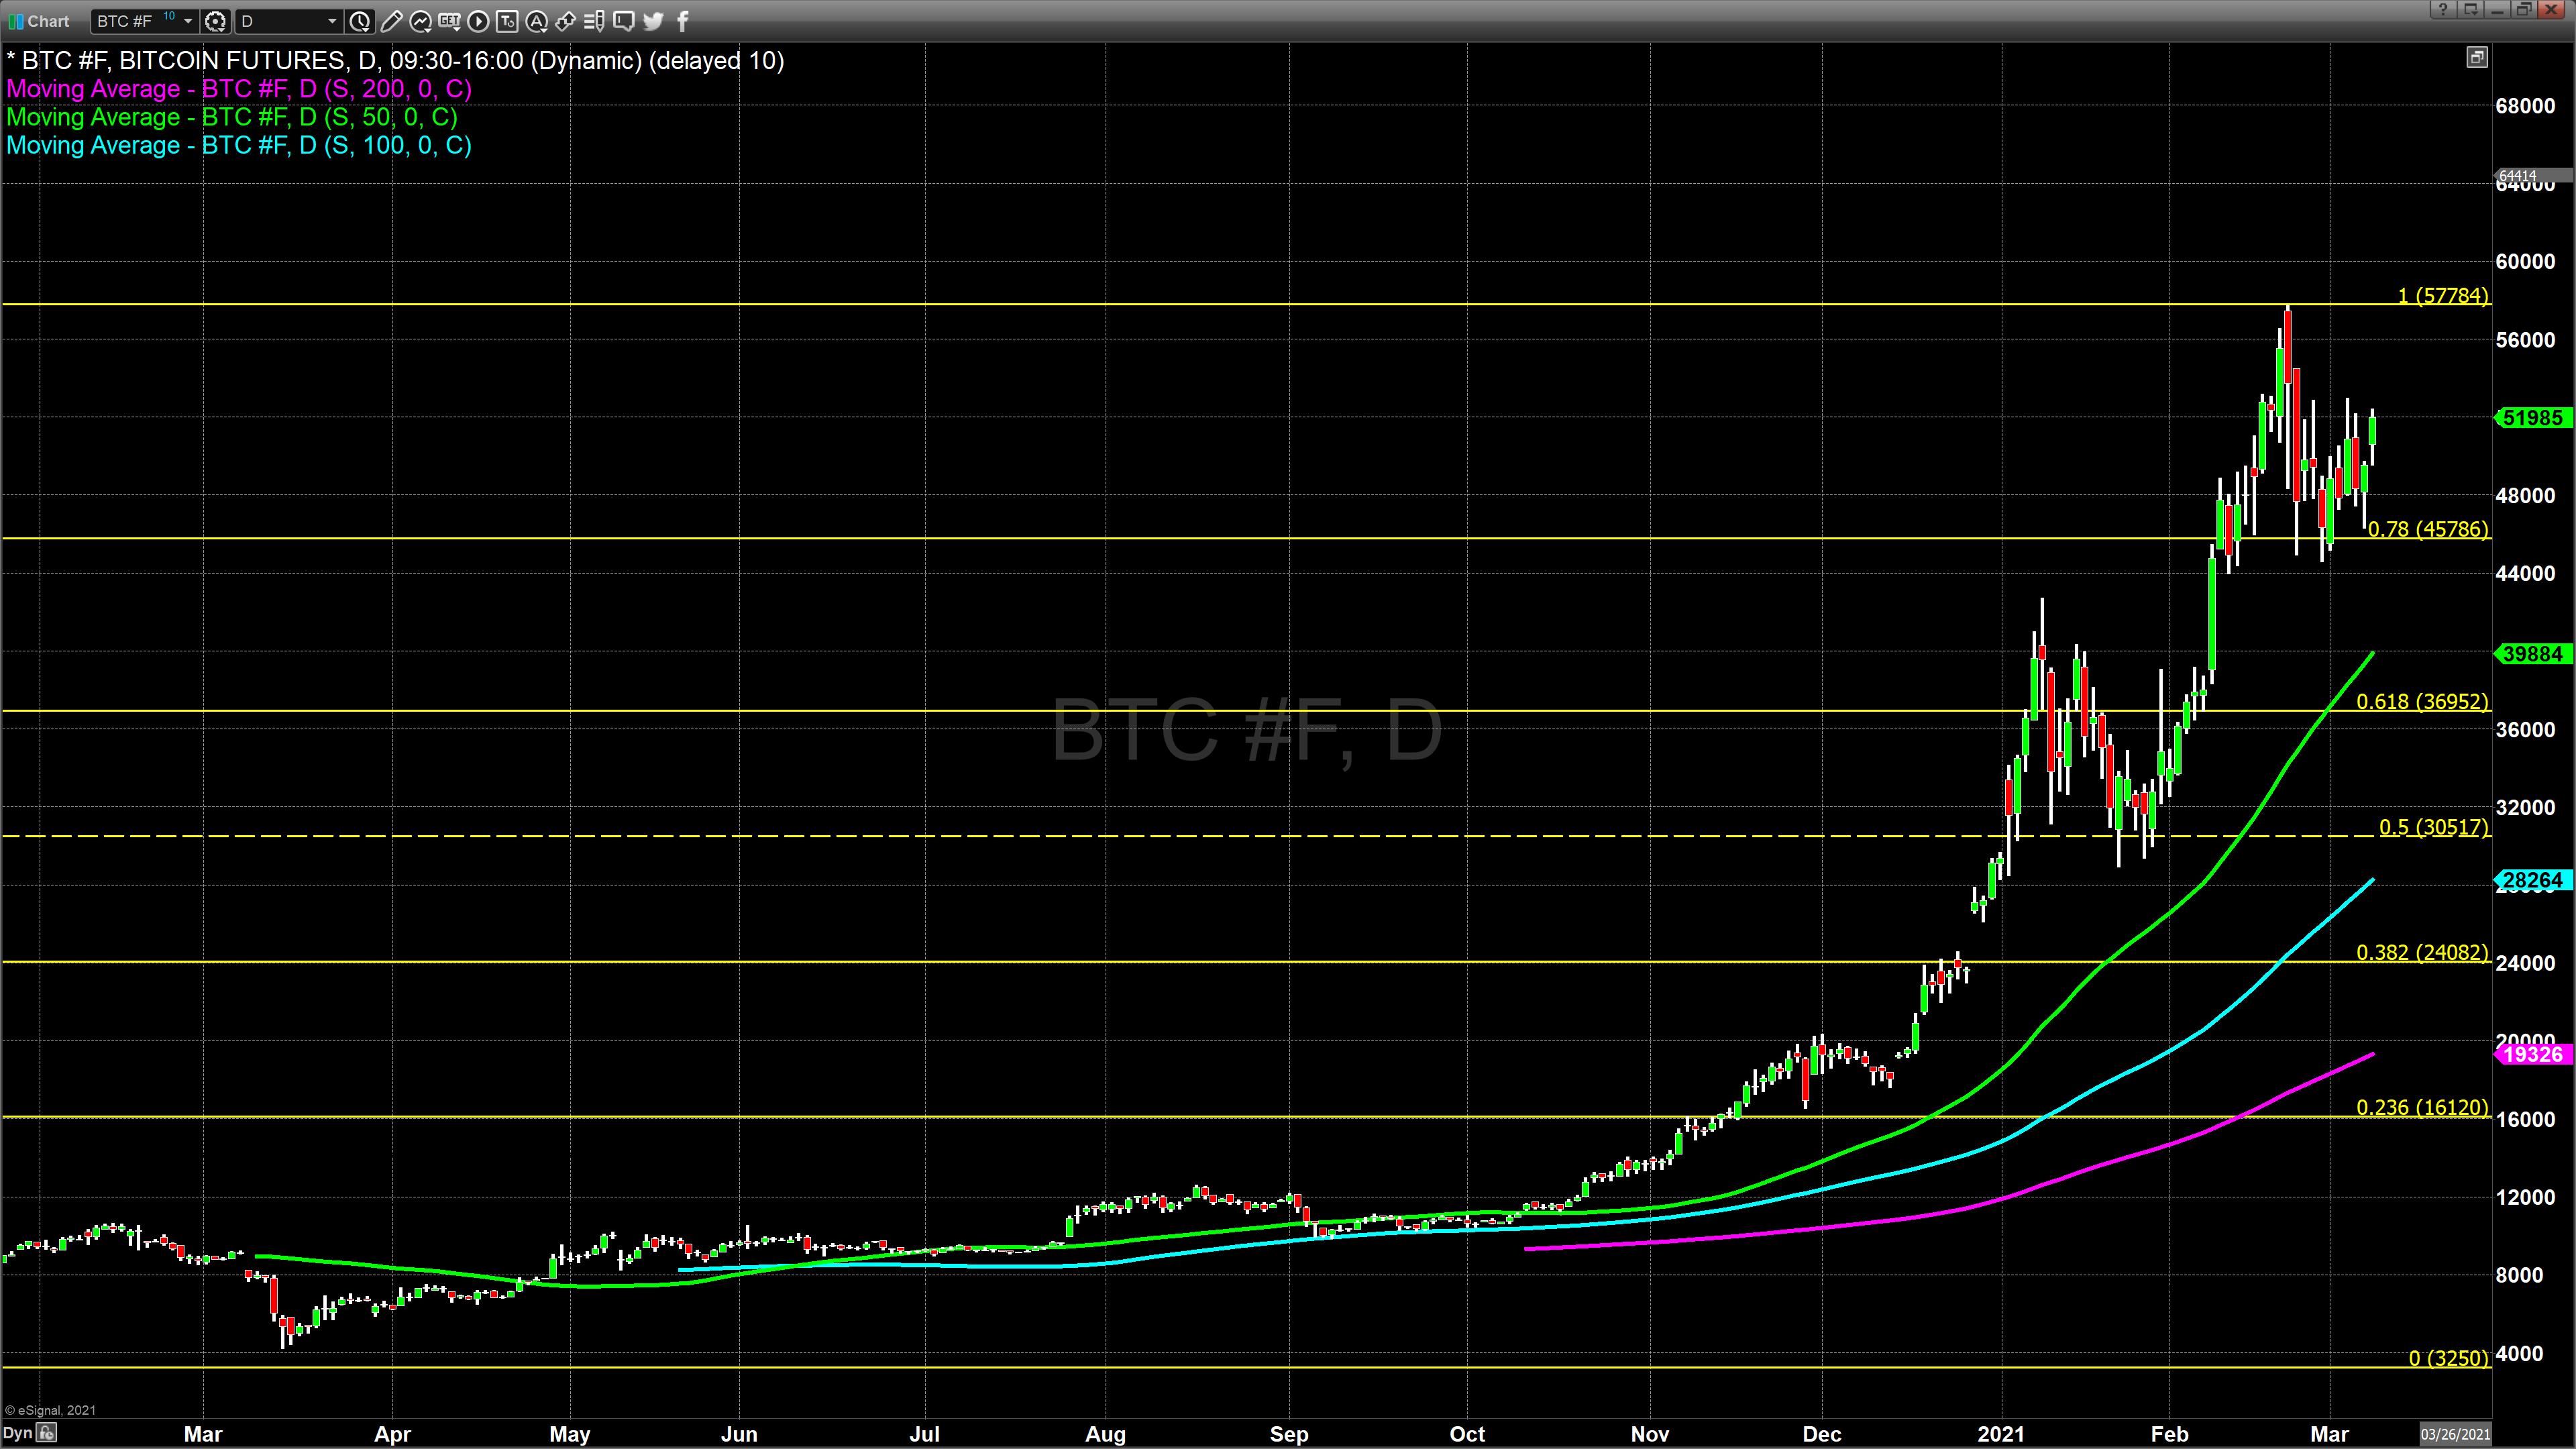 bitcoin futures march 8